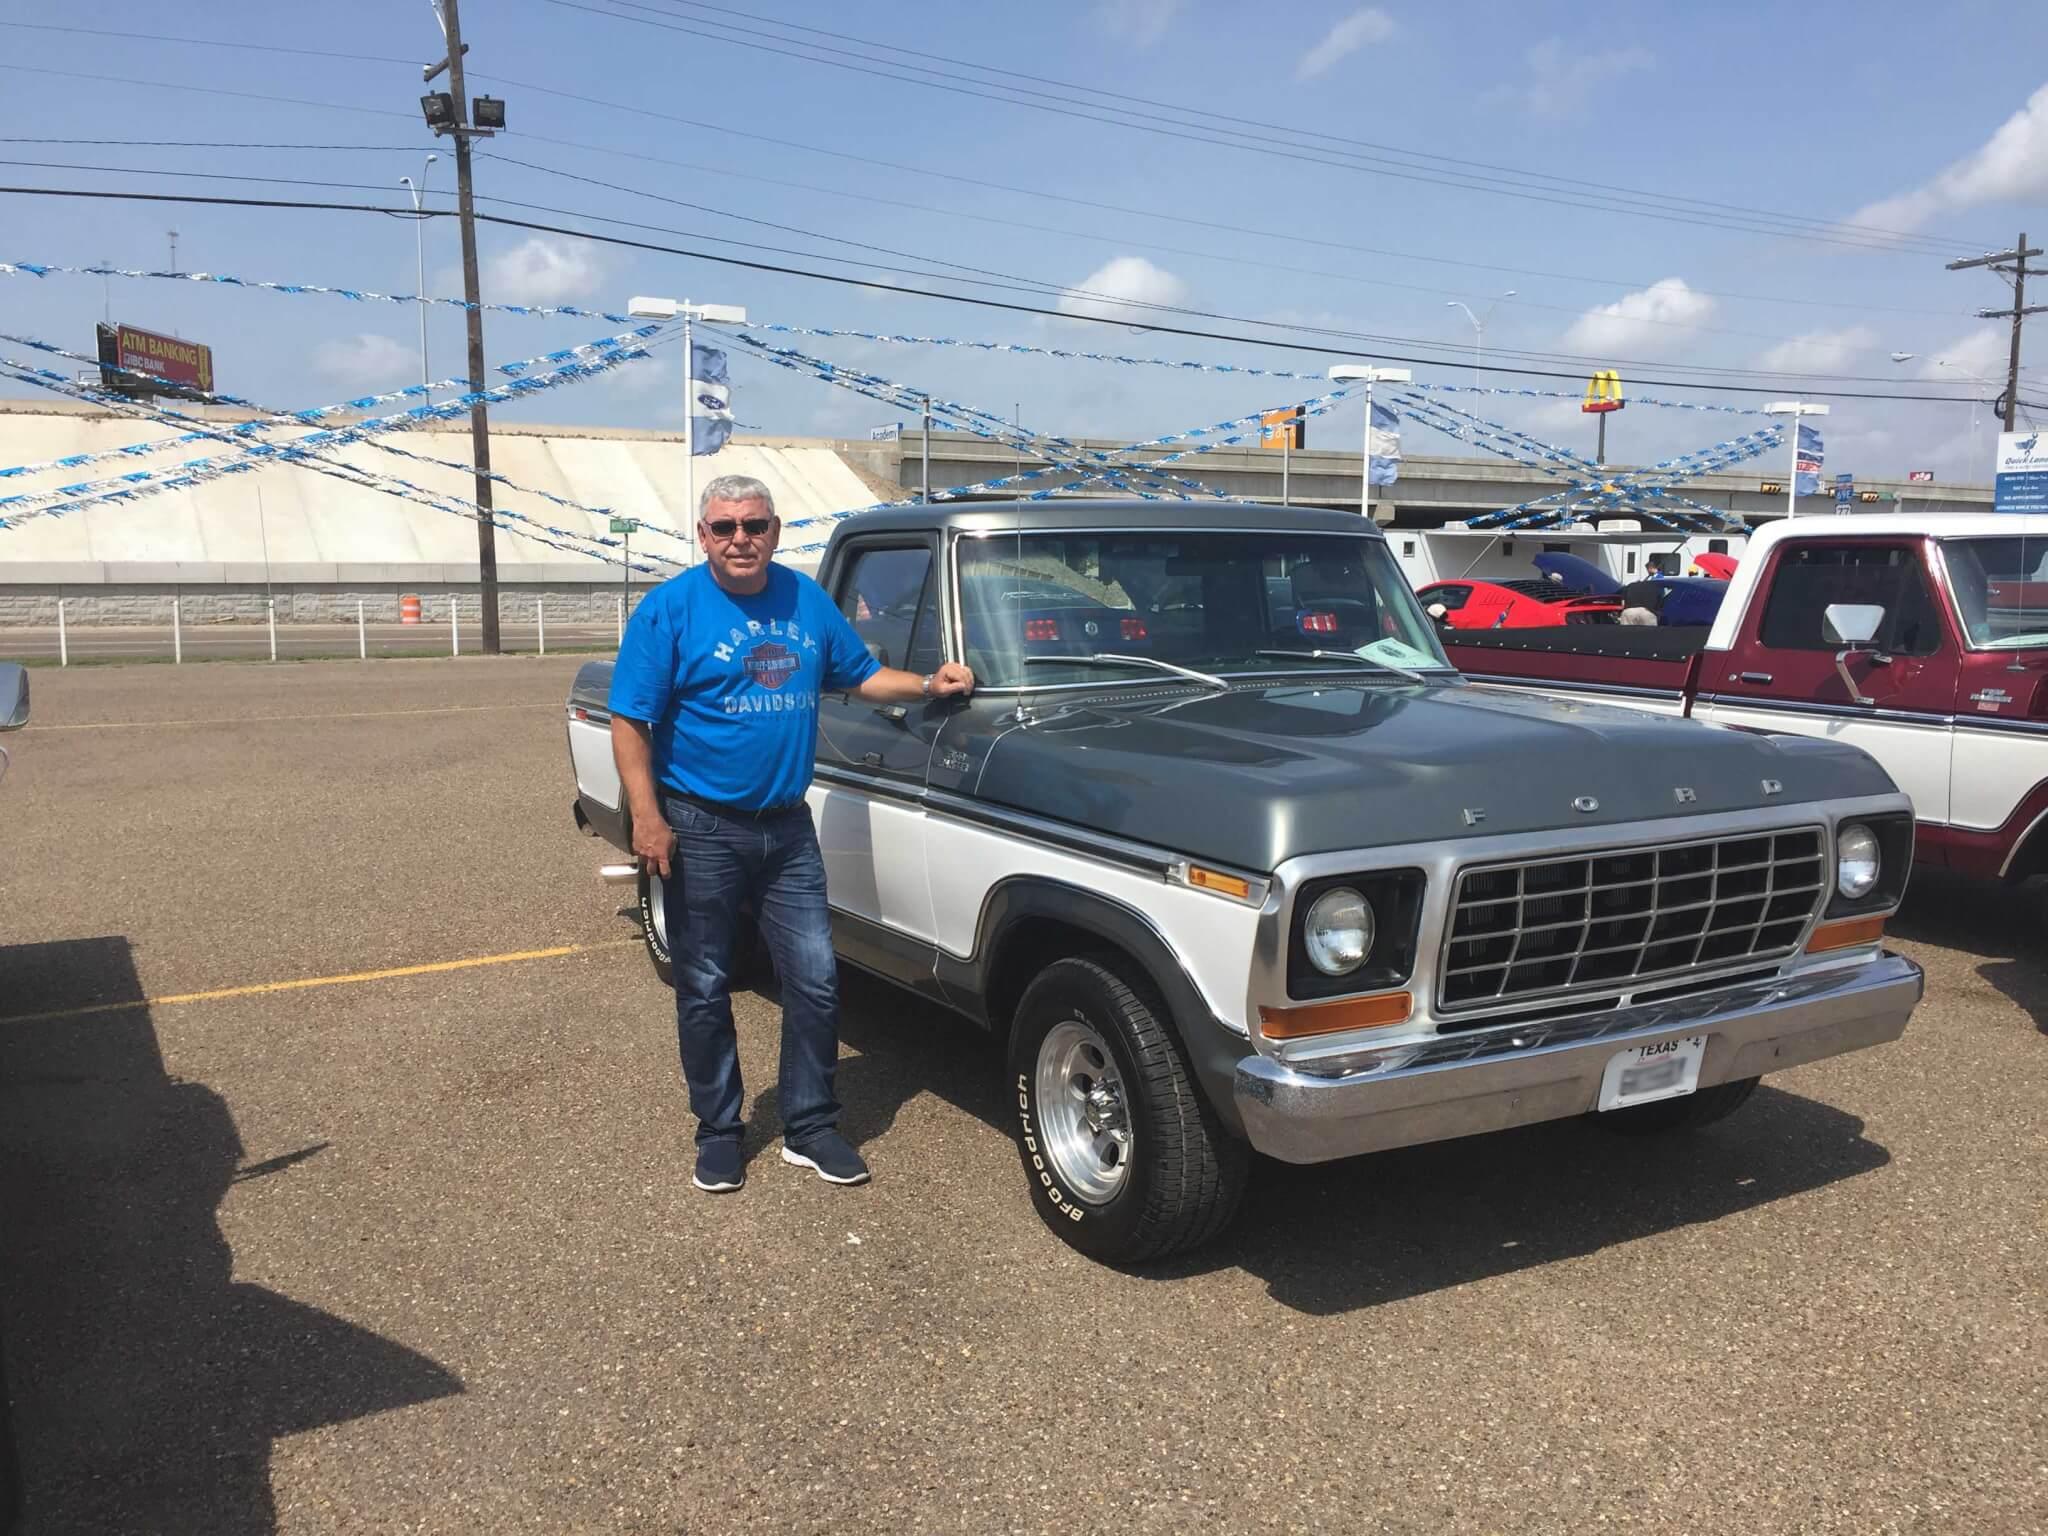 1978 Ford F100 Genaro M LMC Truck Life